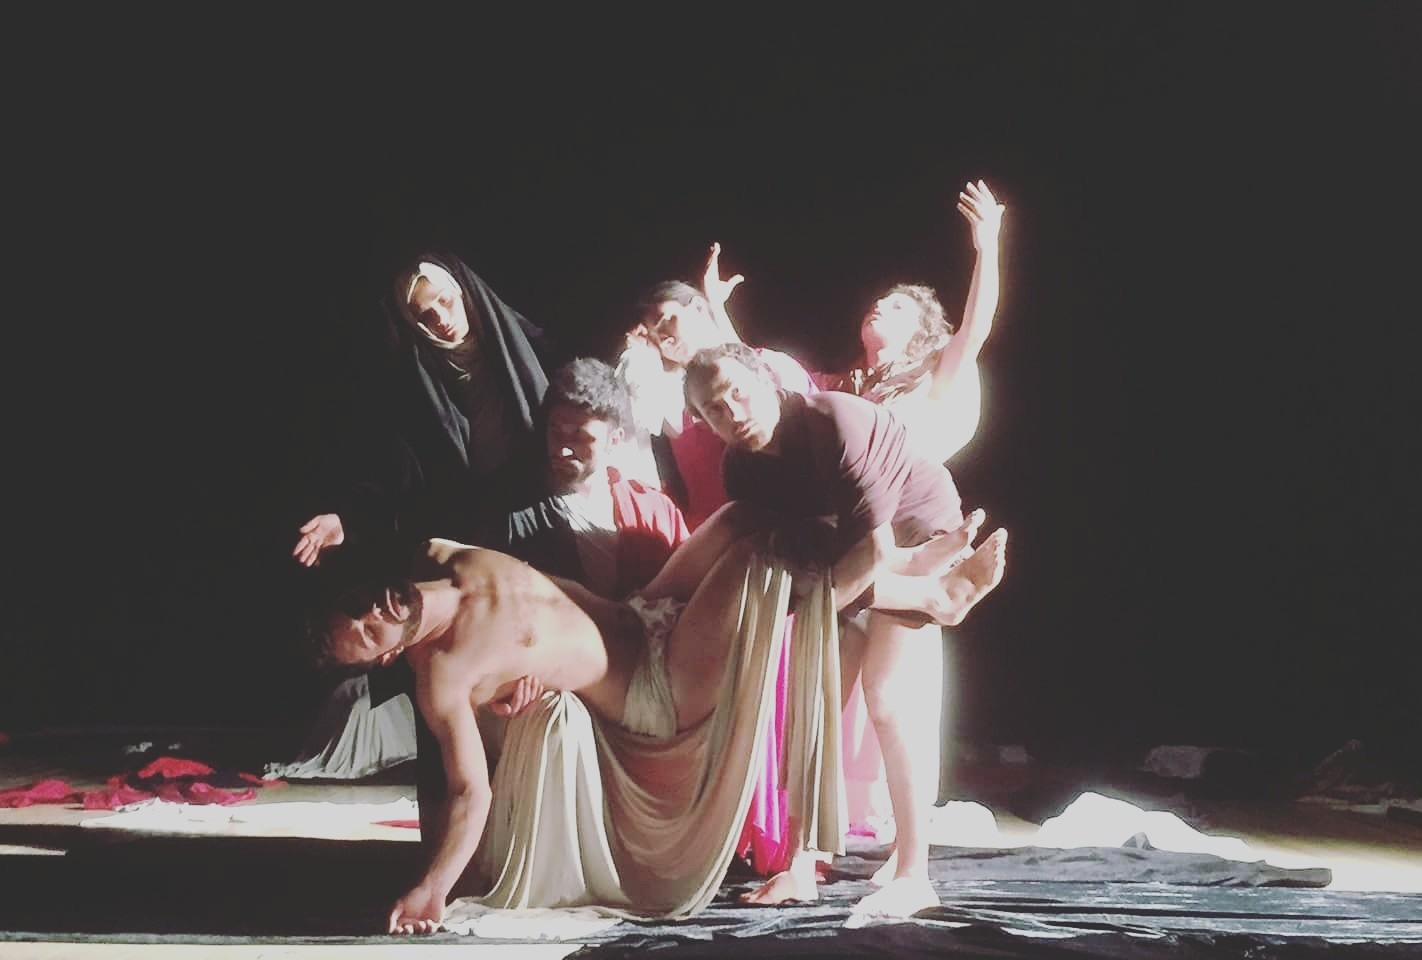 Caravaggio rivive al teatro De Berardinis in 23 tableaux vivants